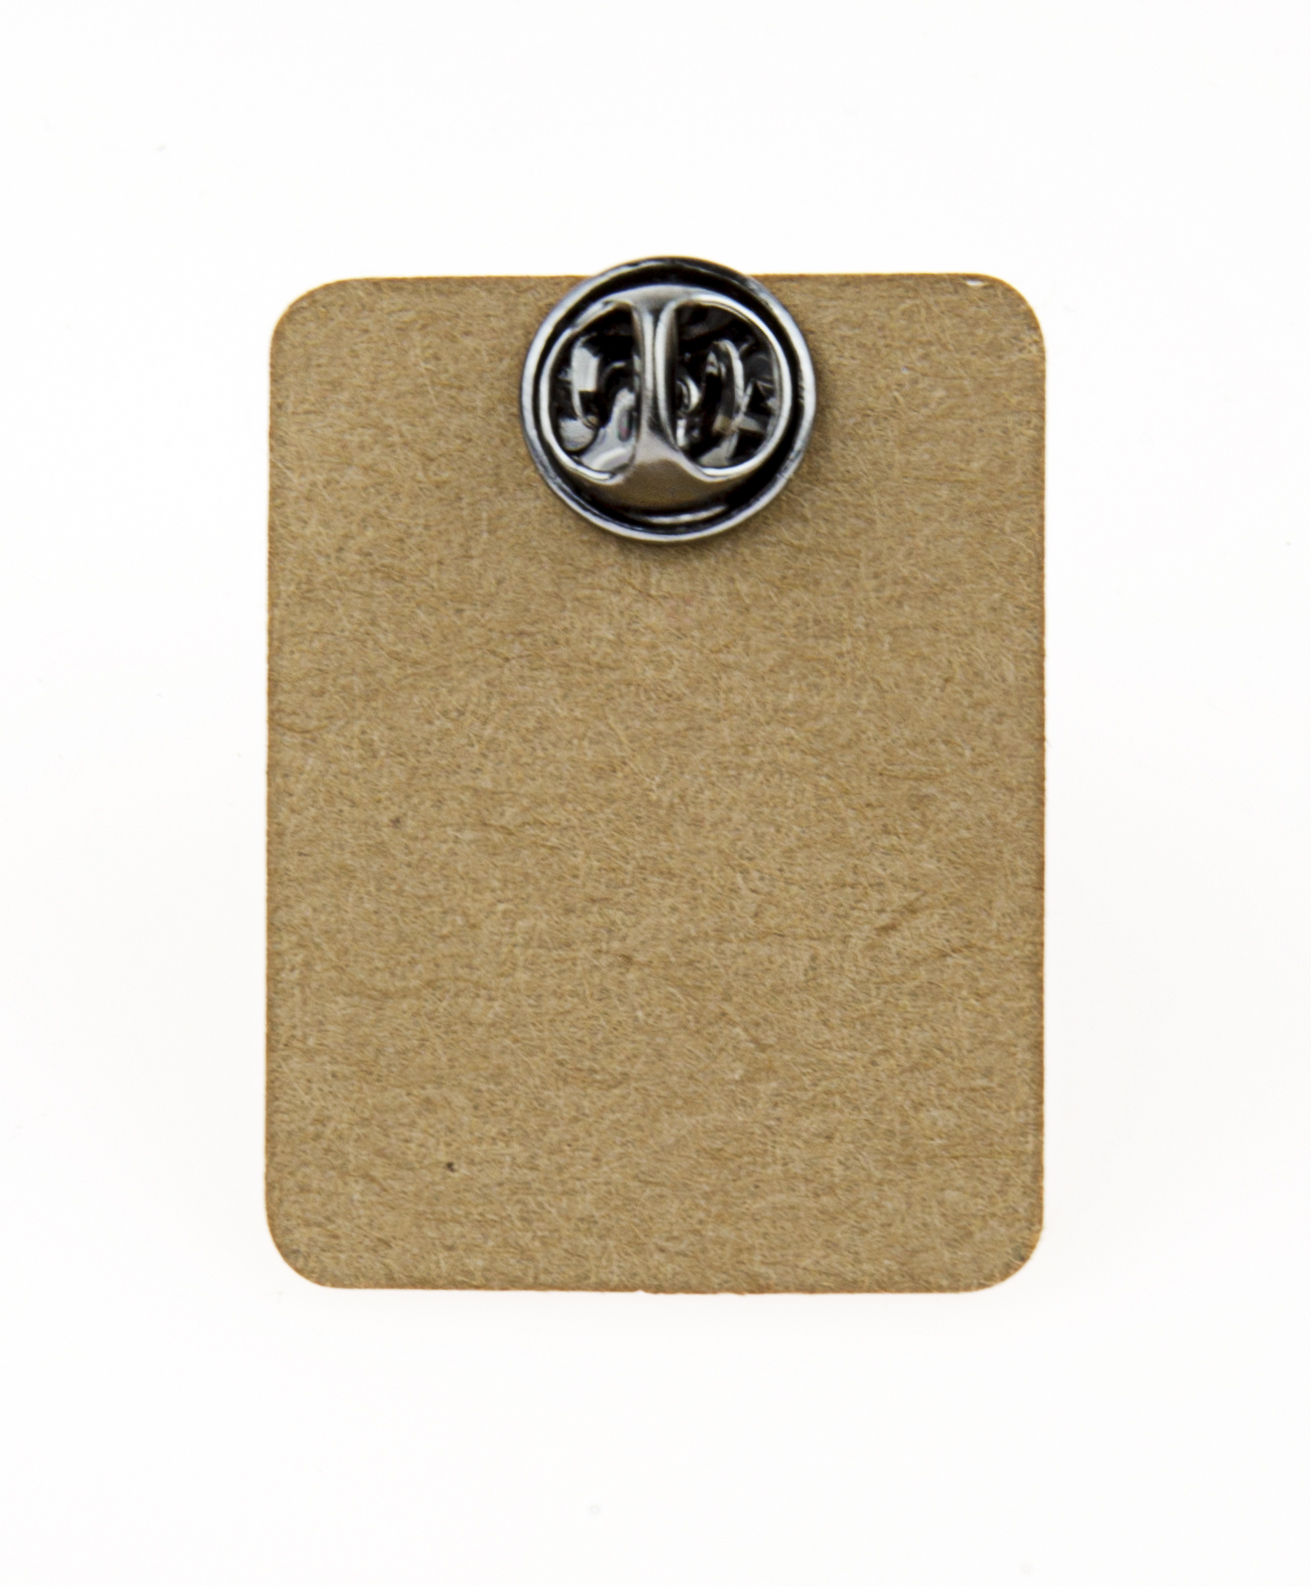 Metal Bug with Eye Dots Enamel Pin Badge